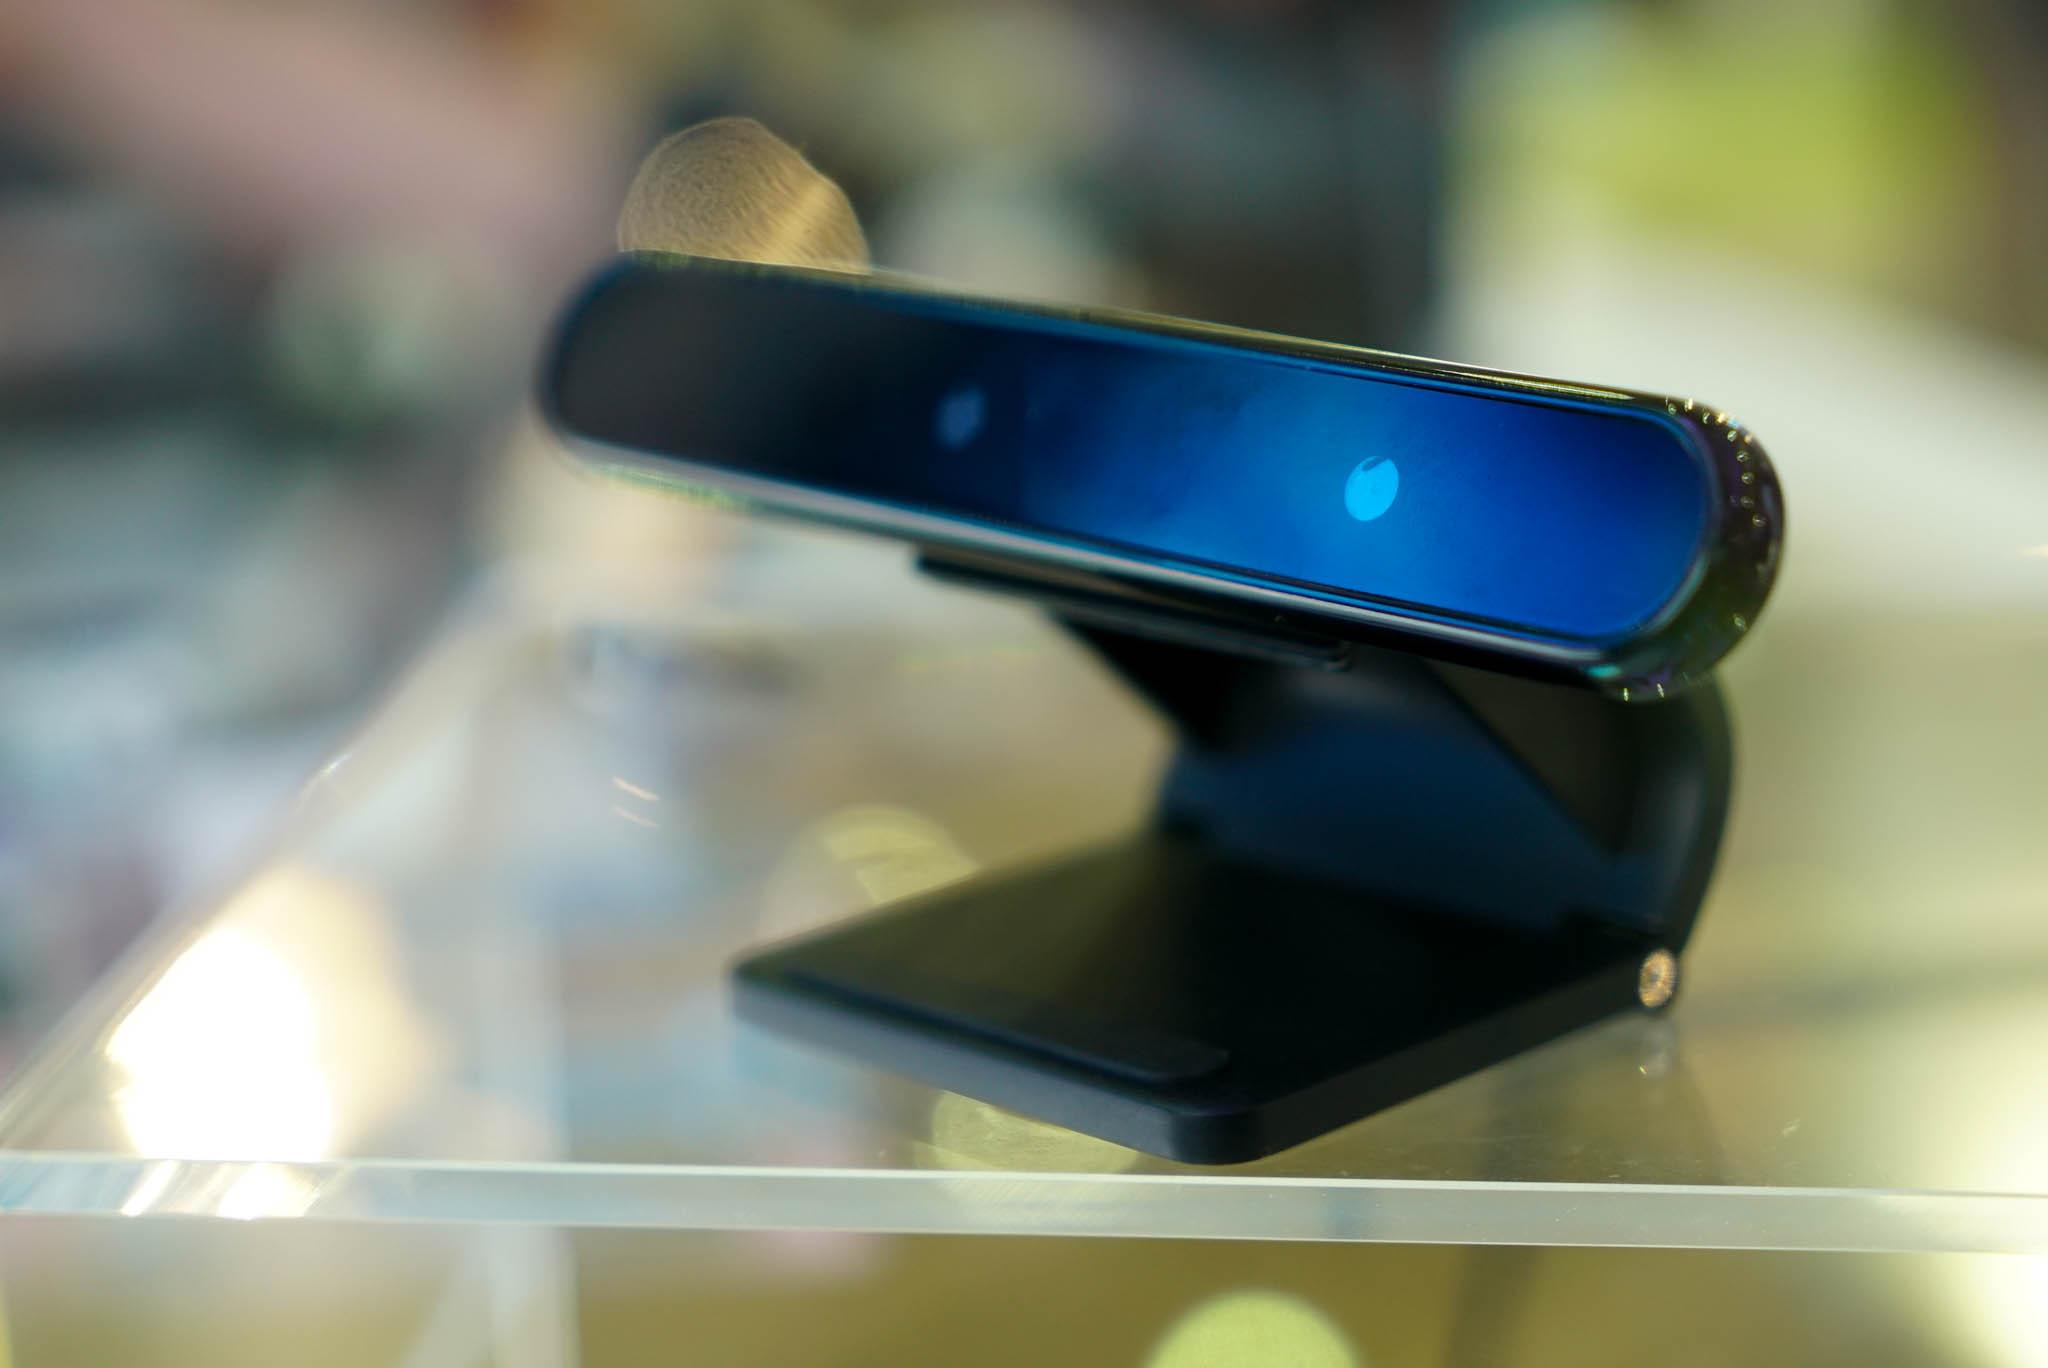 Upcoming USB accessories add Windows Hello capabilities to ...